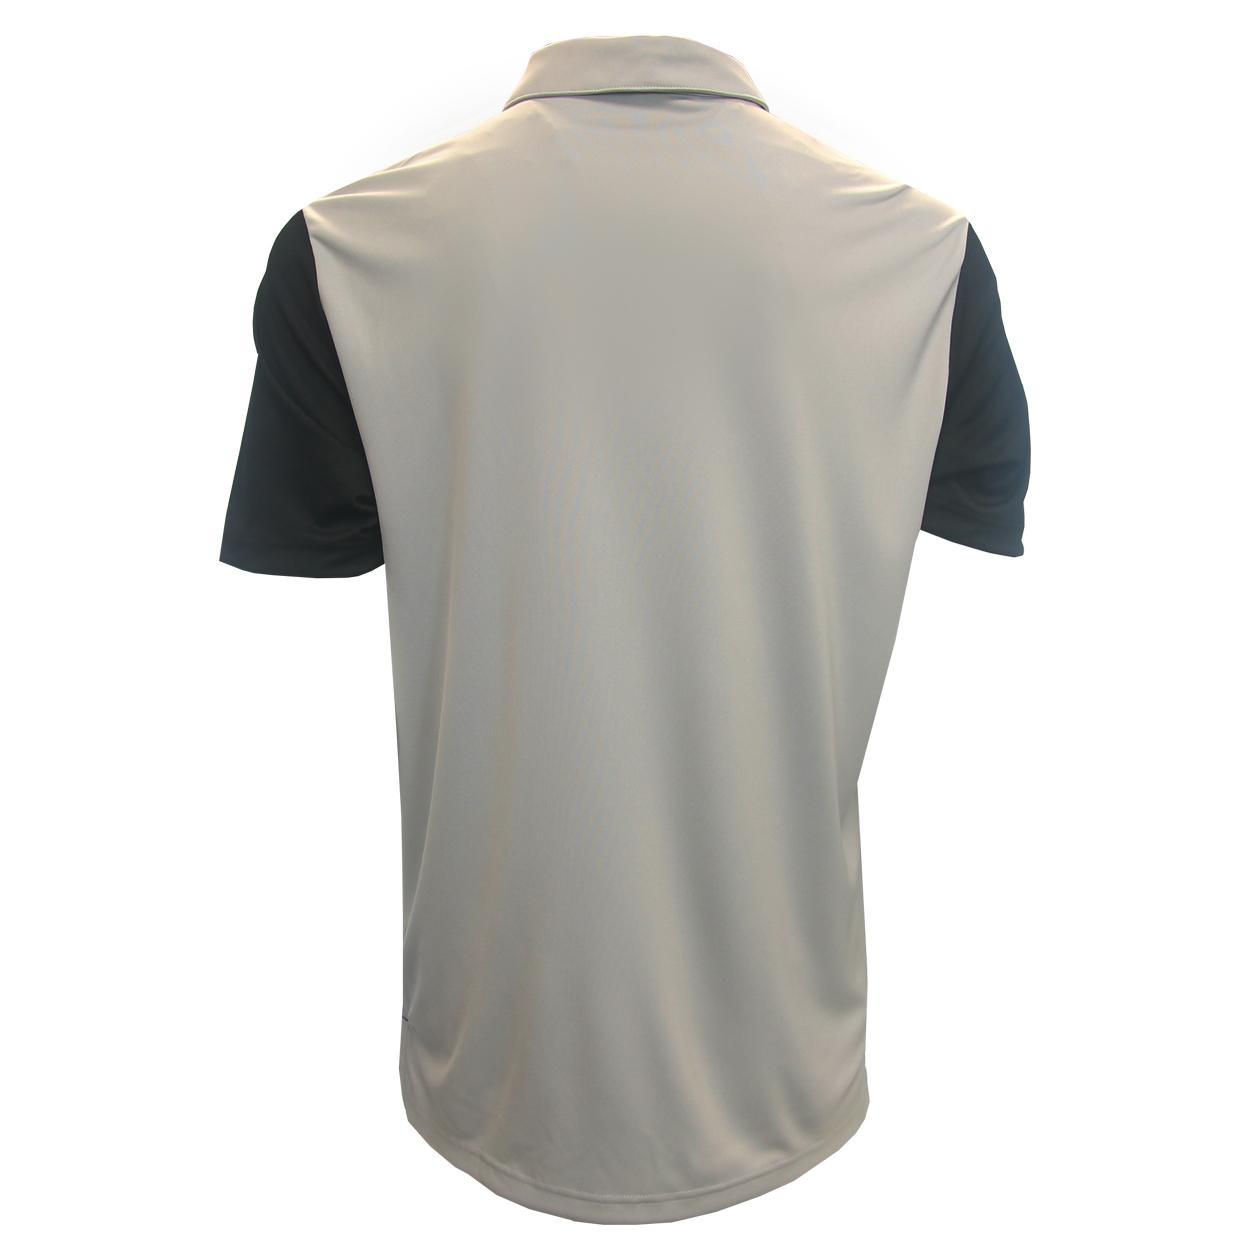 Adidas-Golf-Men-039-s-Black-Stripe-Polo-Shirt-NEW thumbnail 4